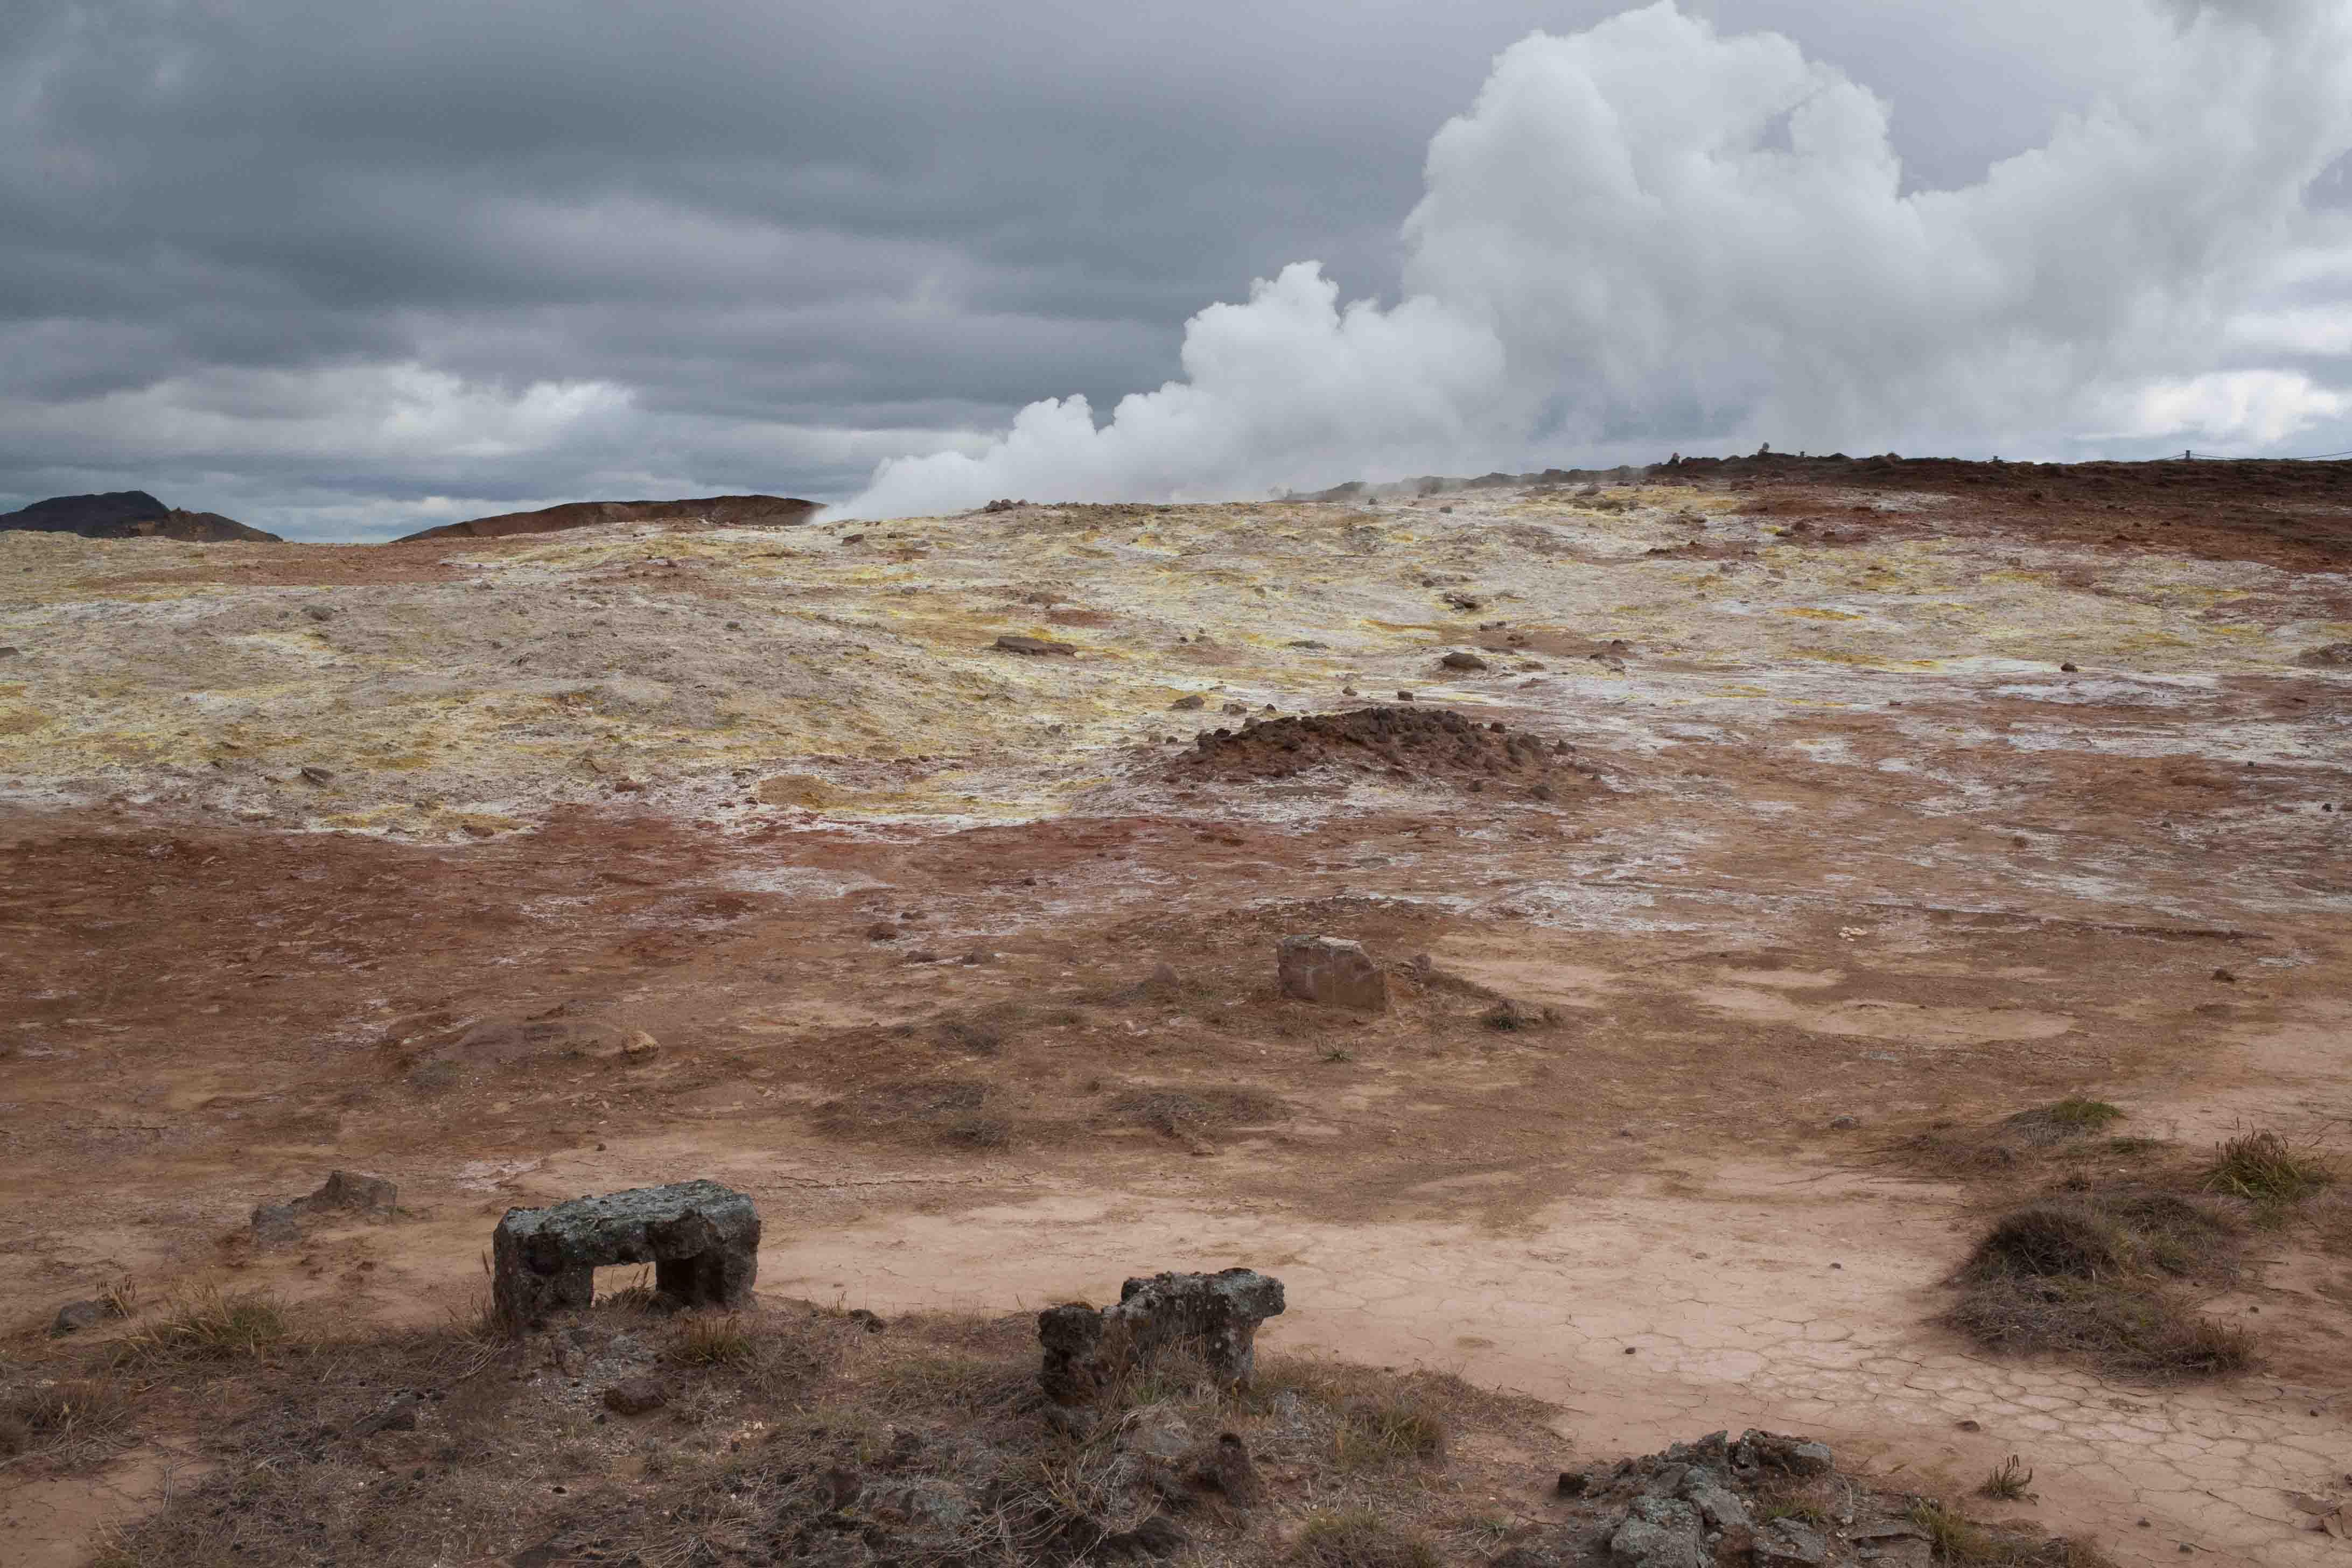 IcelandPart1_photo4.jpg